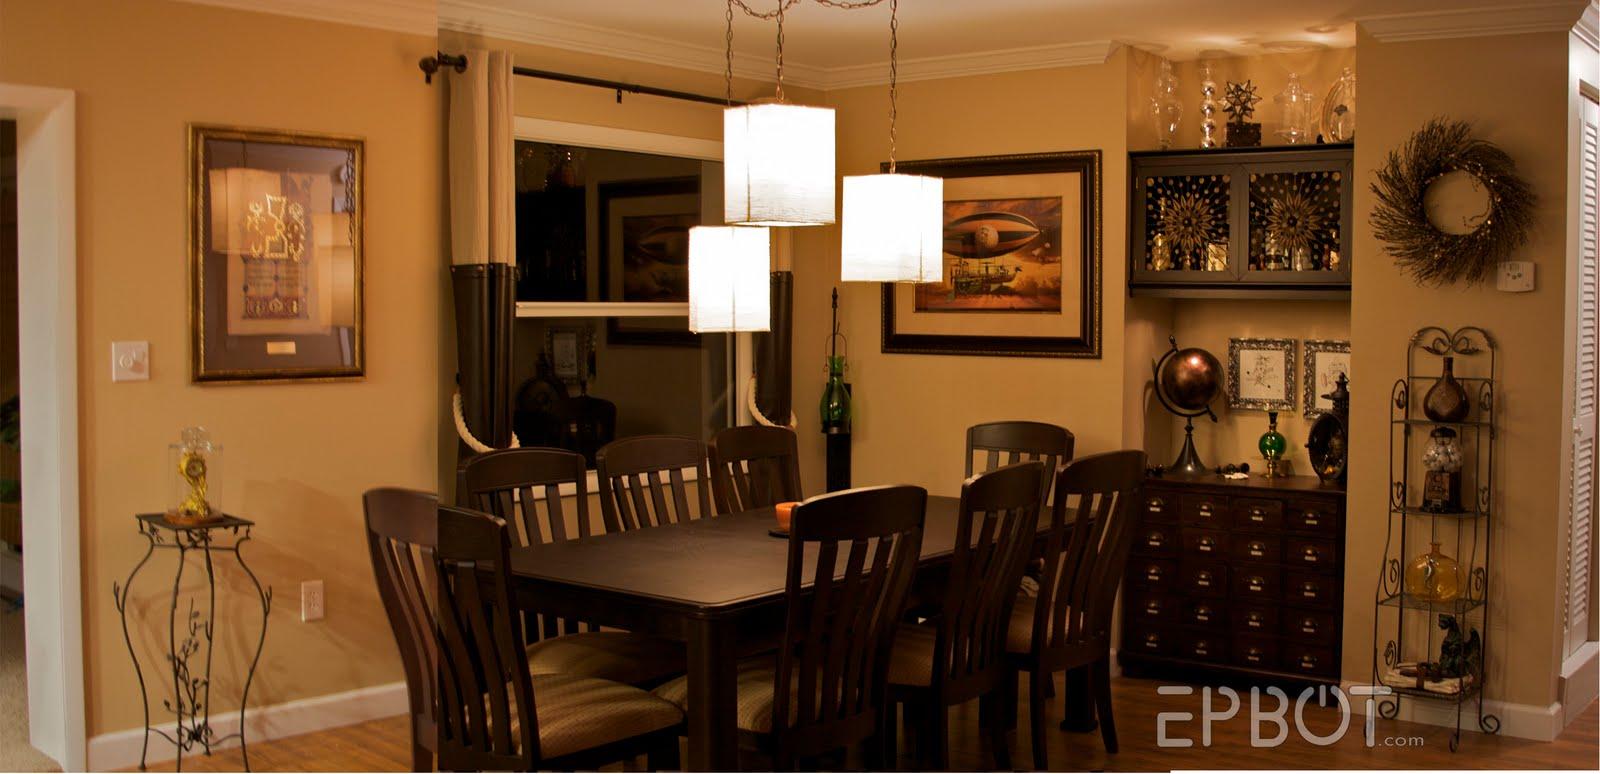 EPBOT My Steampunk Dining Room